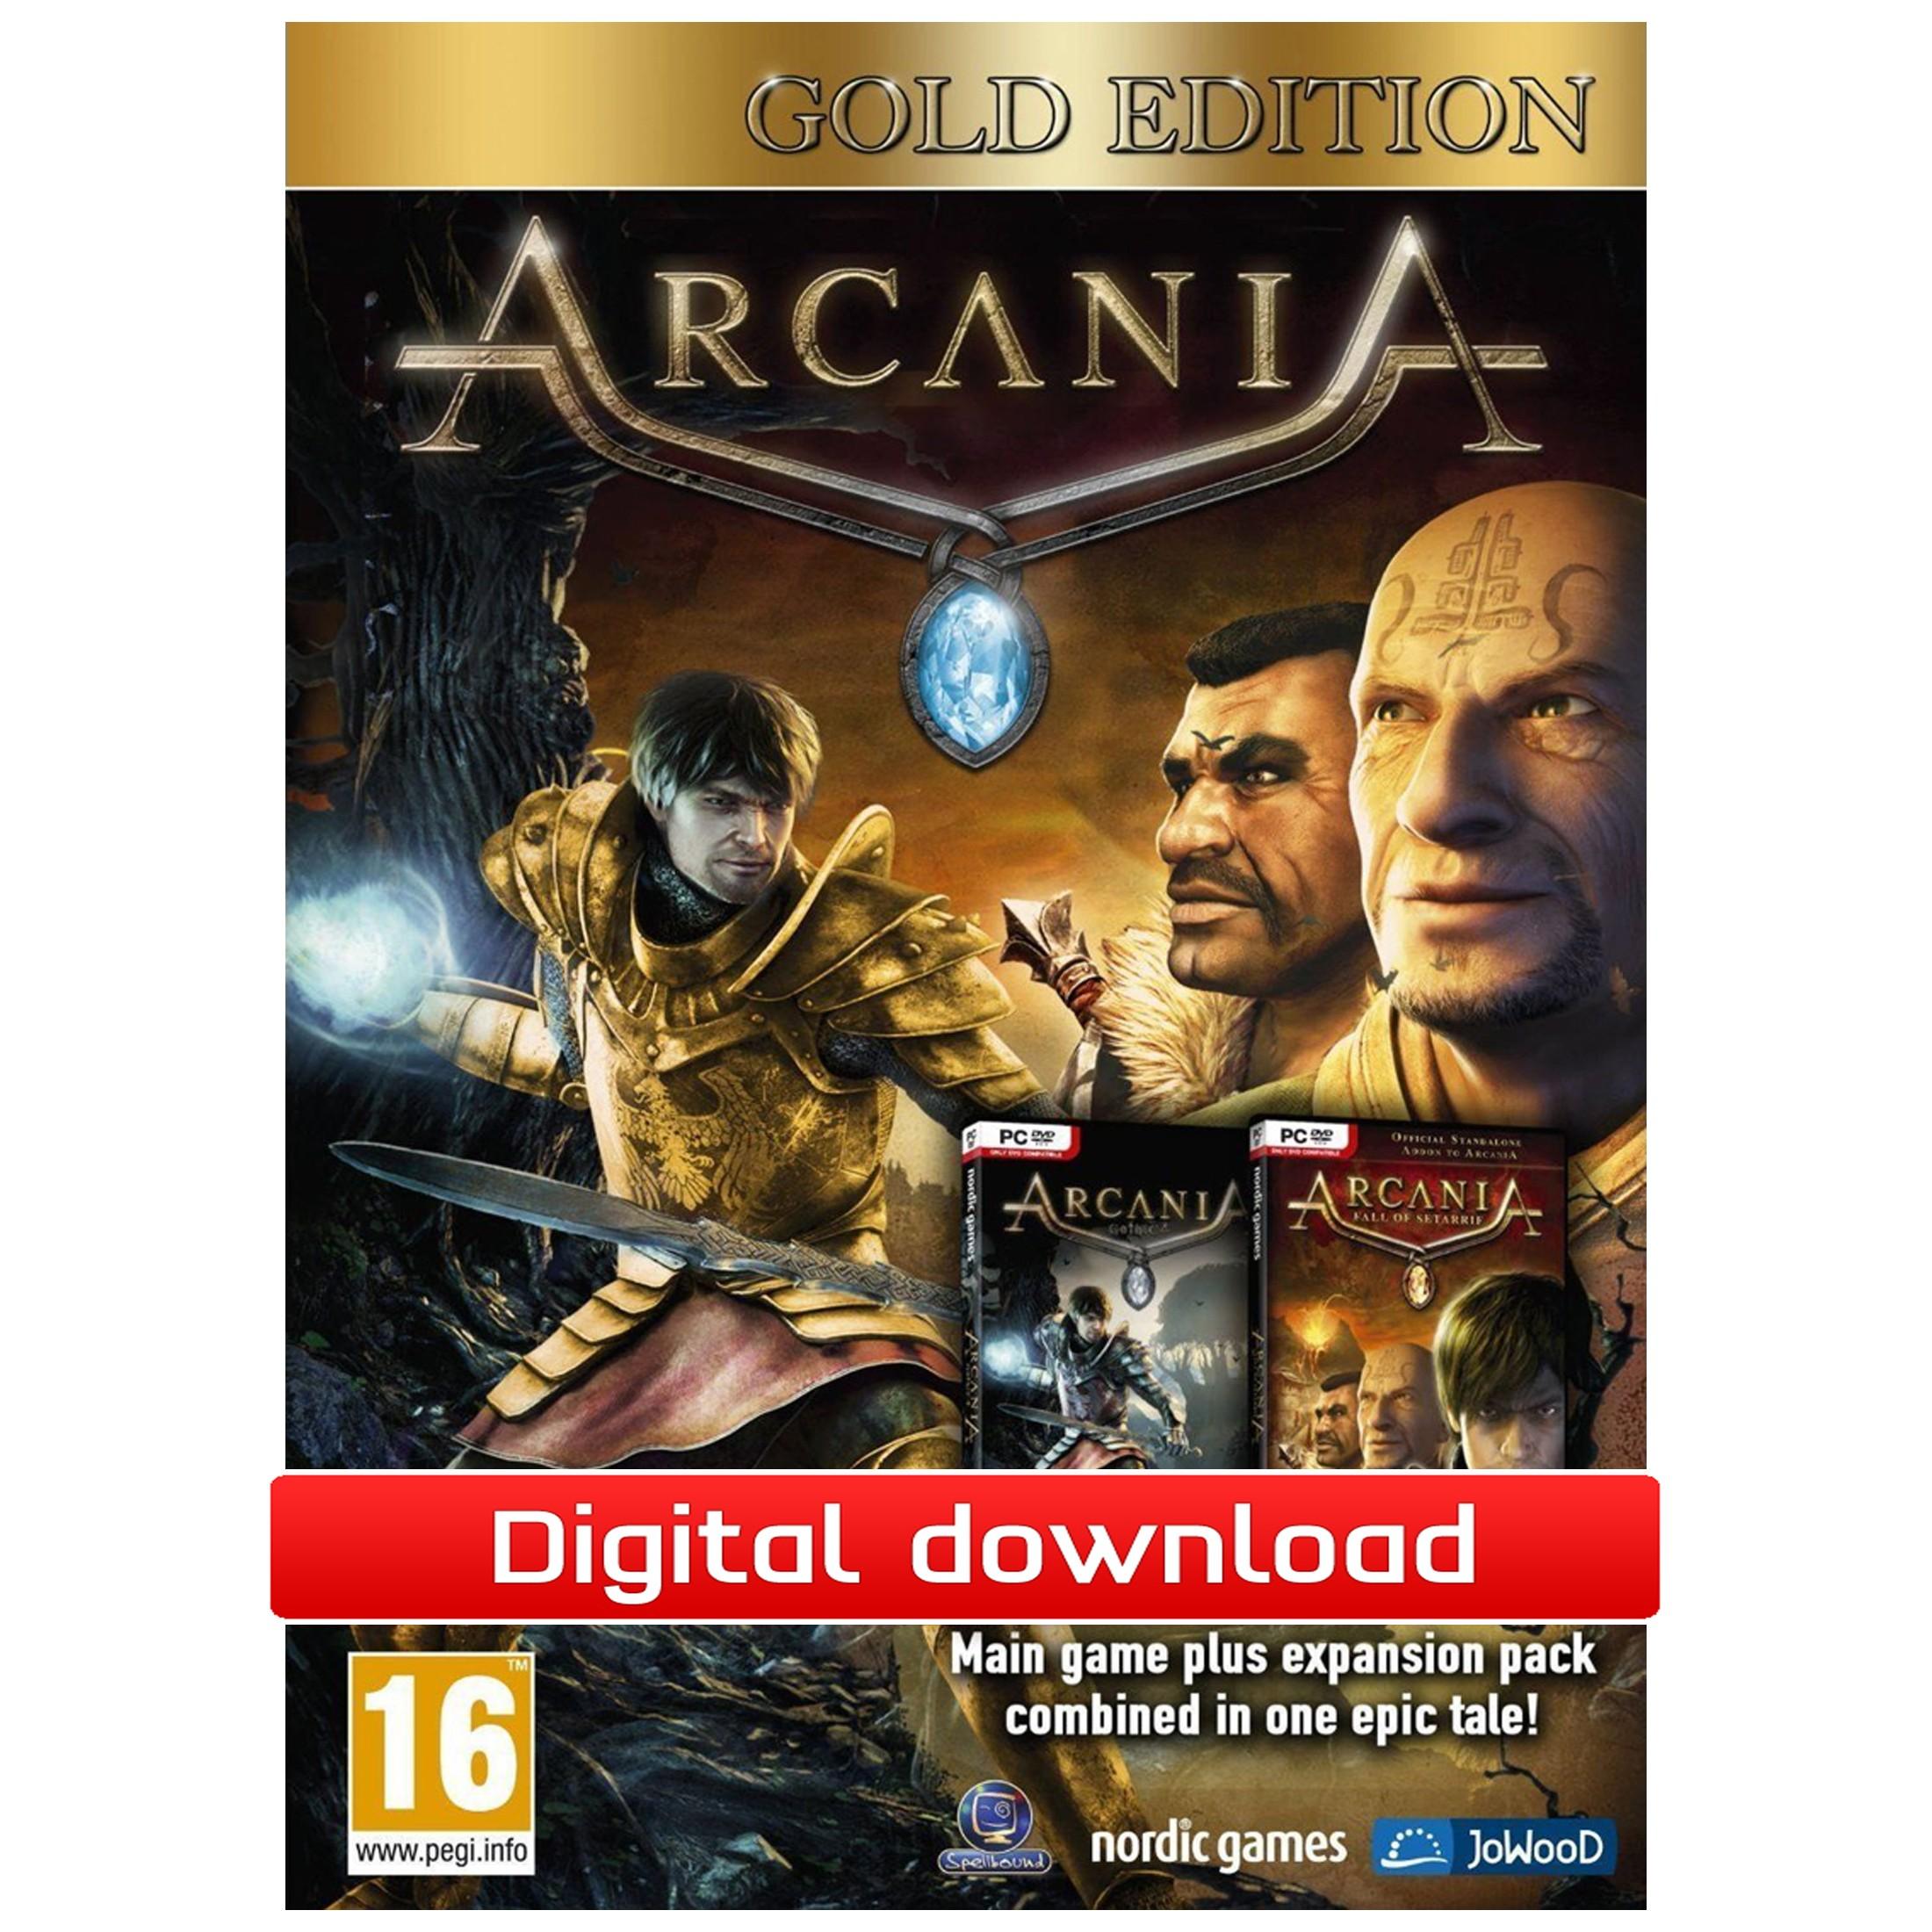 ArcaniA Gold Edition (PC nedlastning) PCDD37549